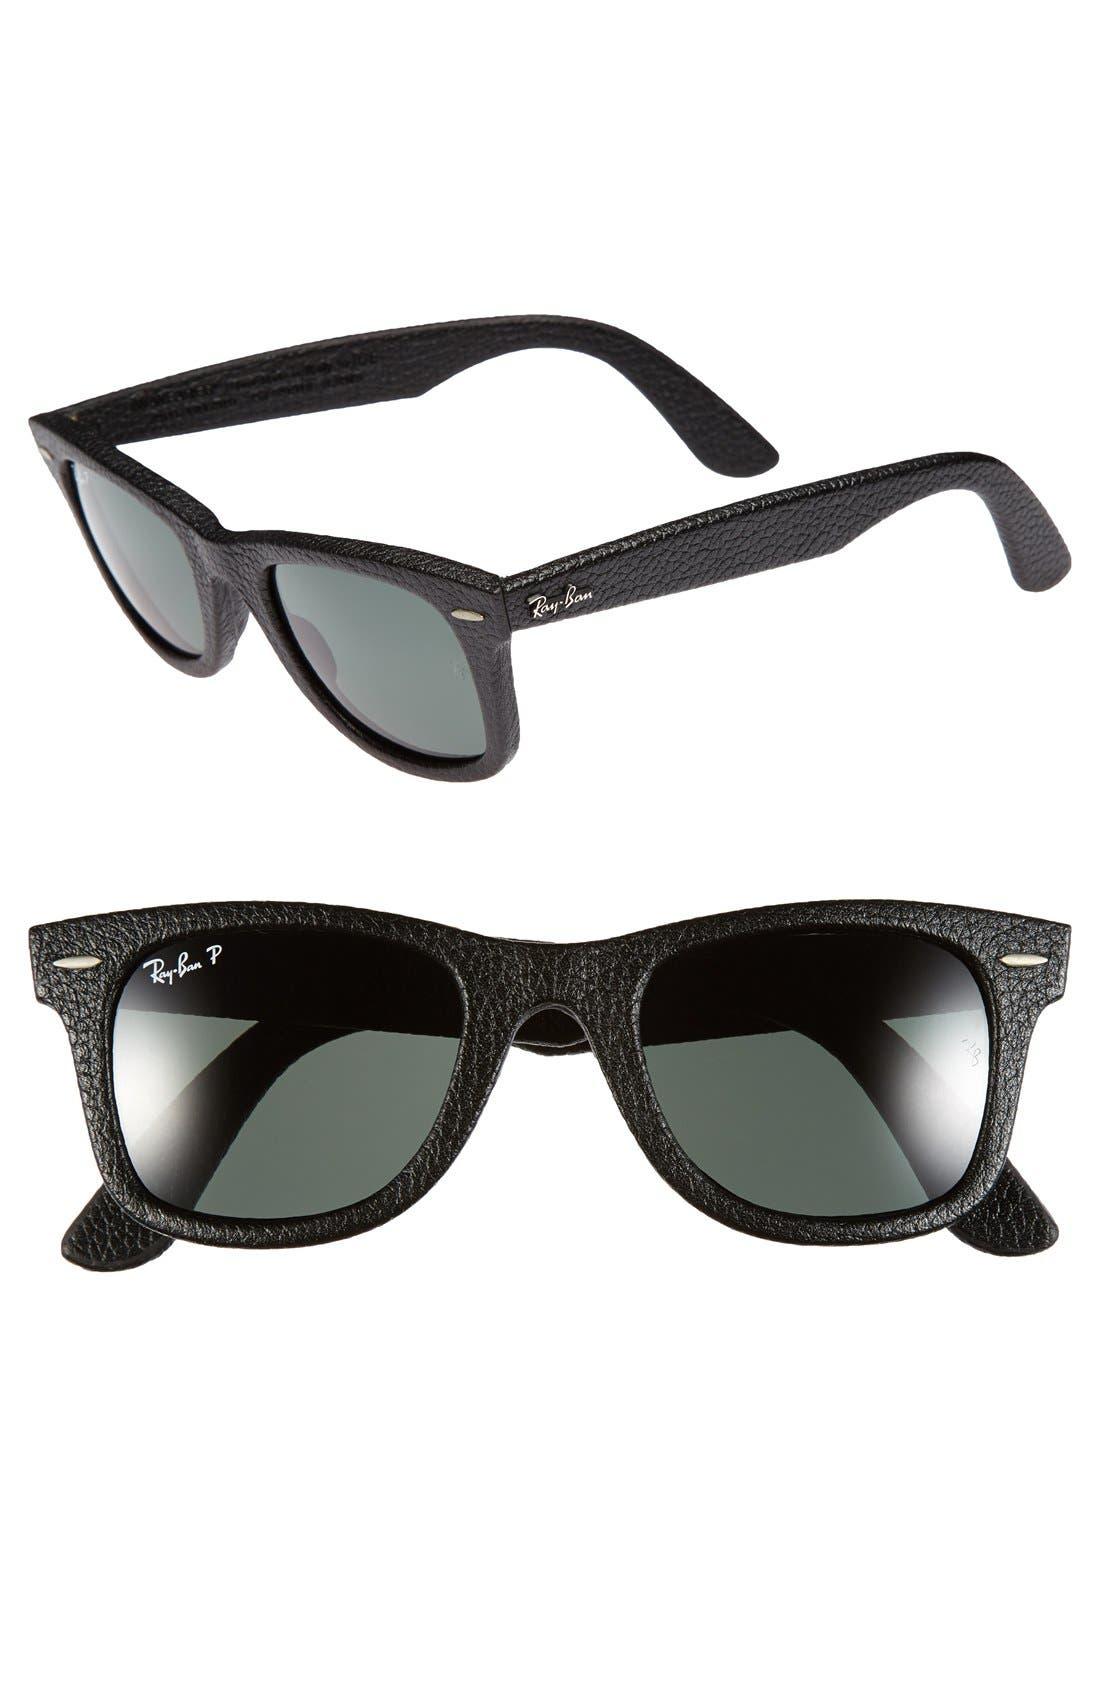 'Wayfarer' 50mm Polarized Leather Sunglasses,                             Main thumbnail 1, color,                             001